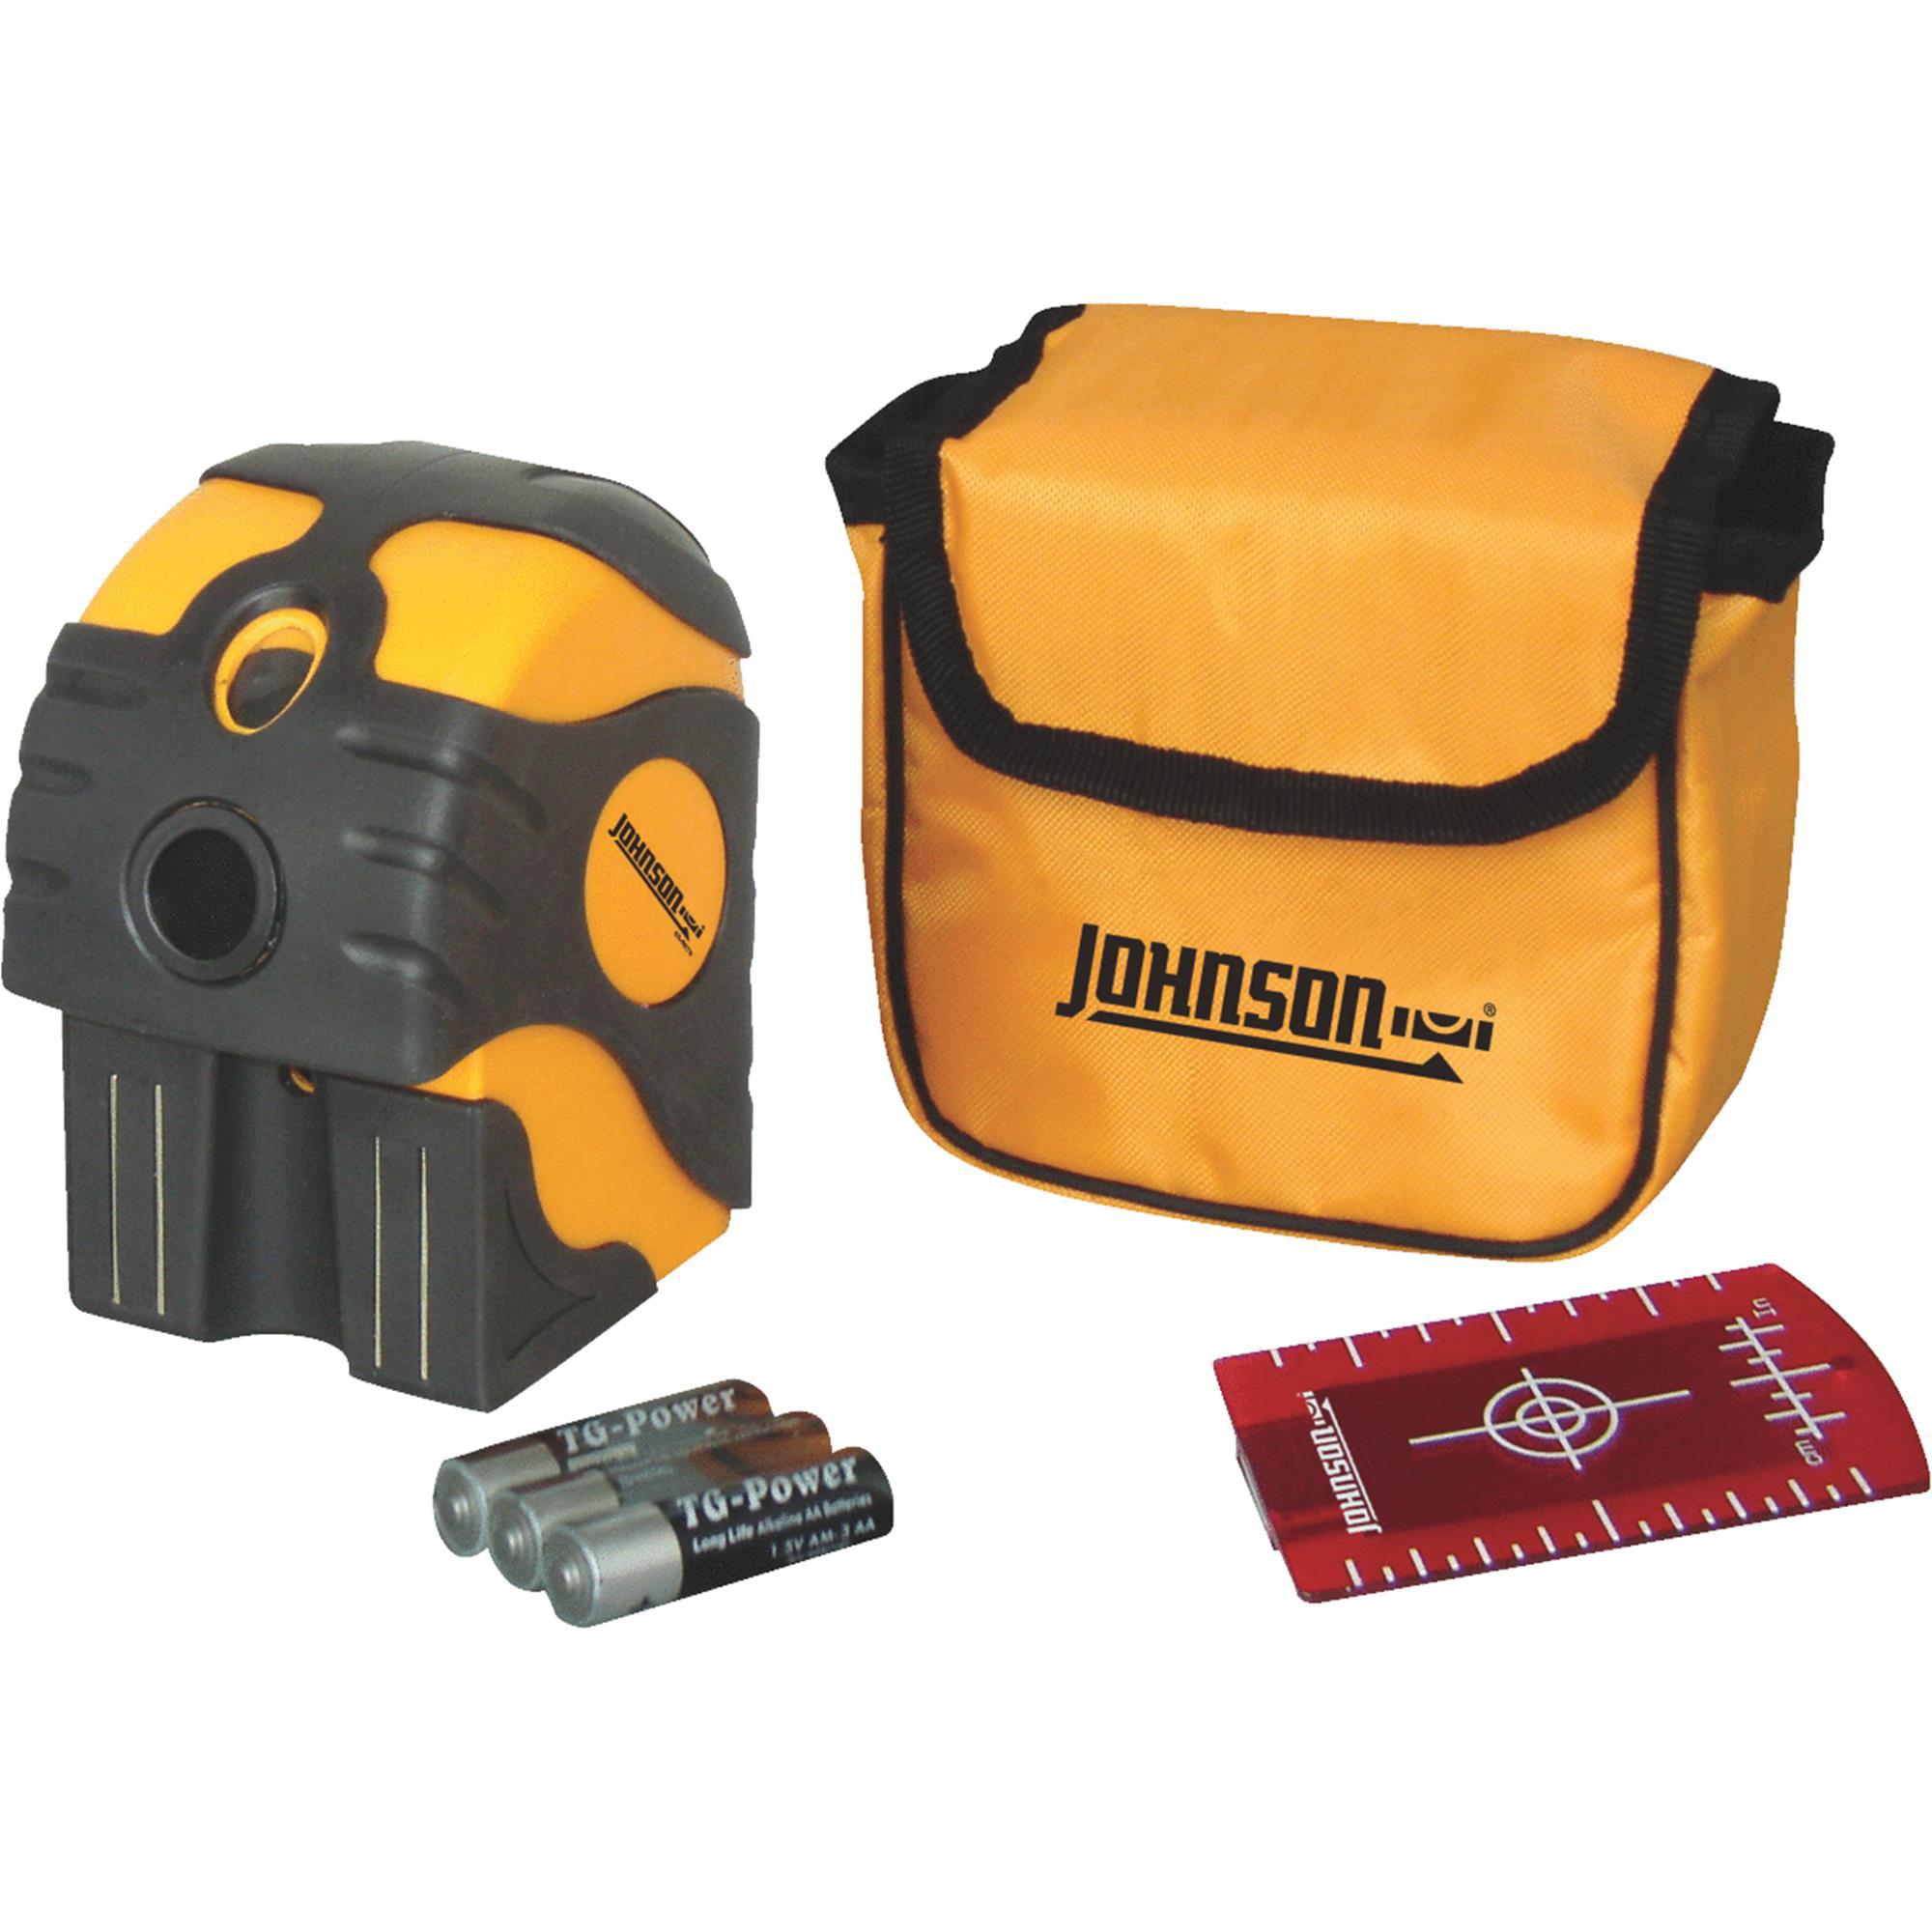 Johnson Level 2-Dot Laser Level by Johnson Level & Tool